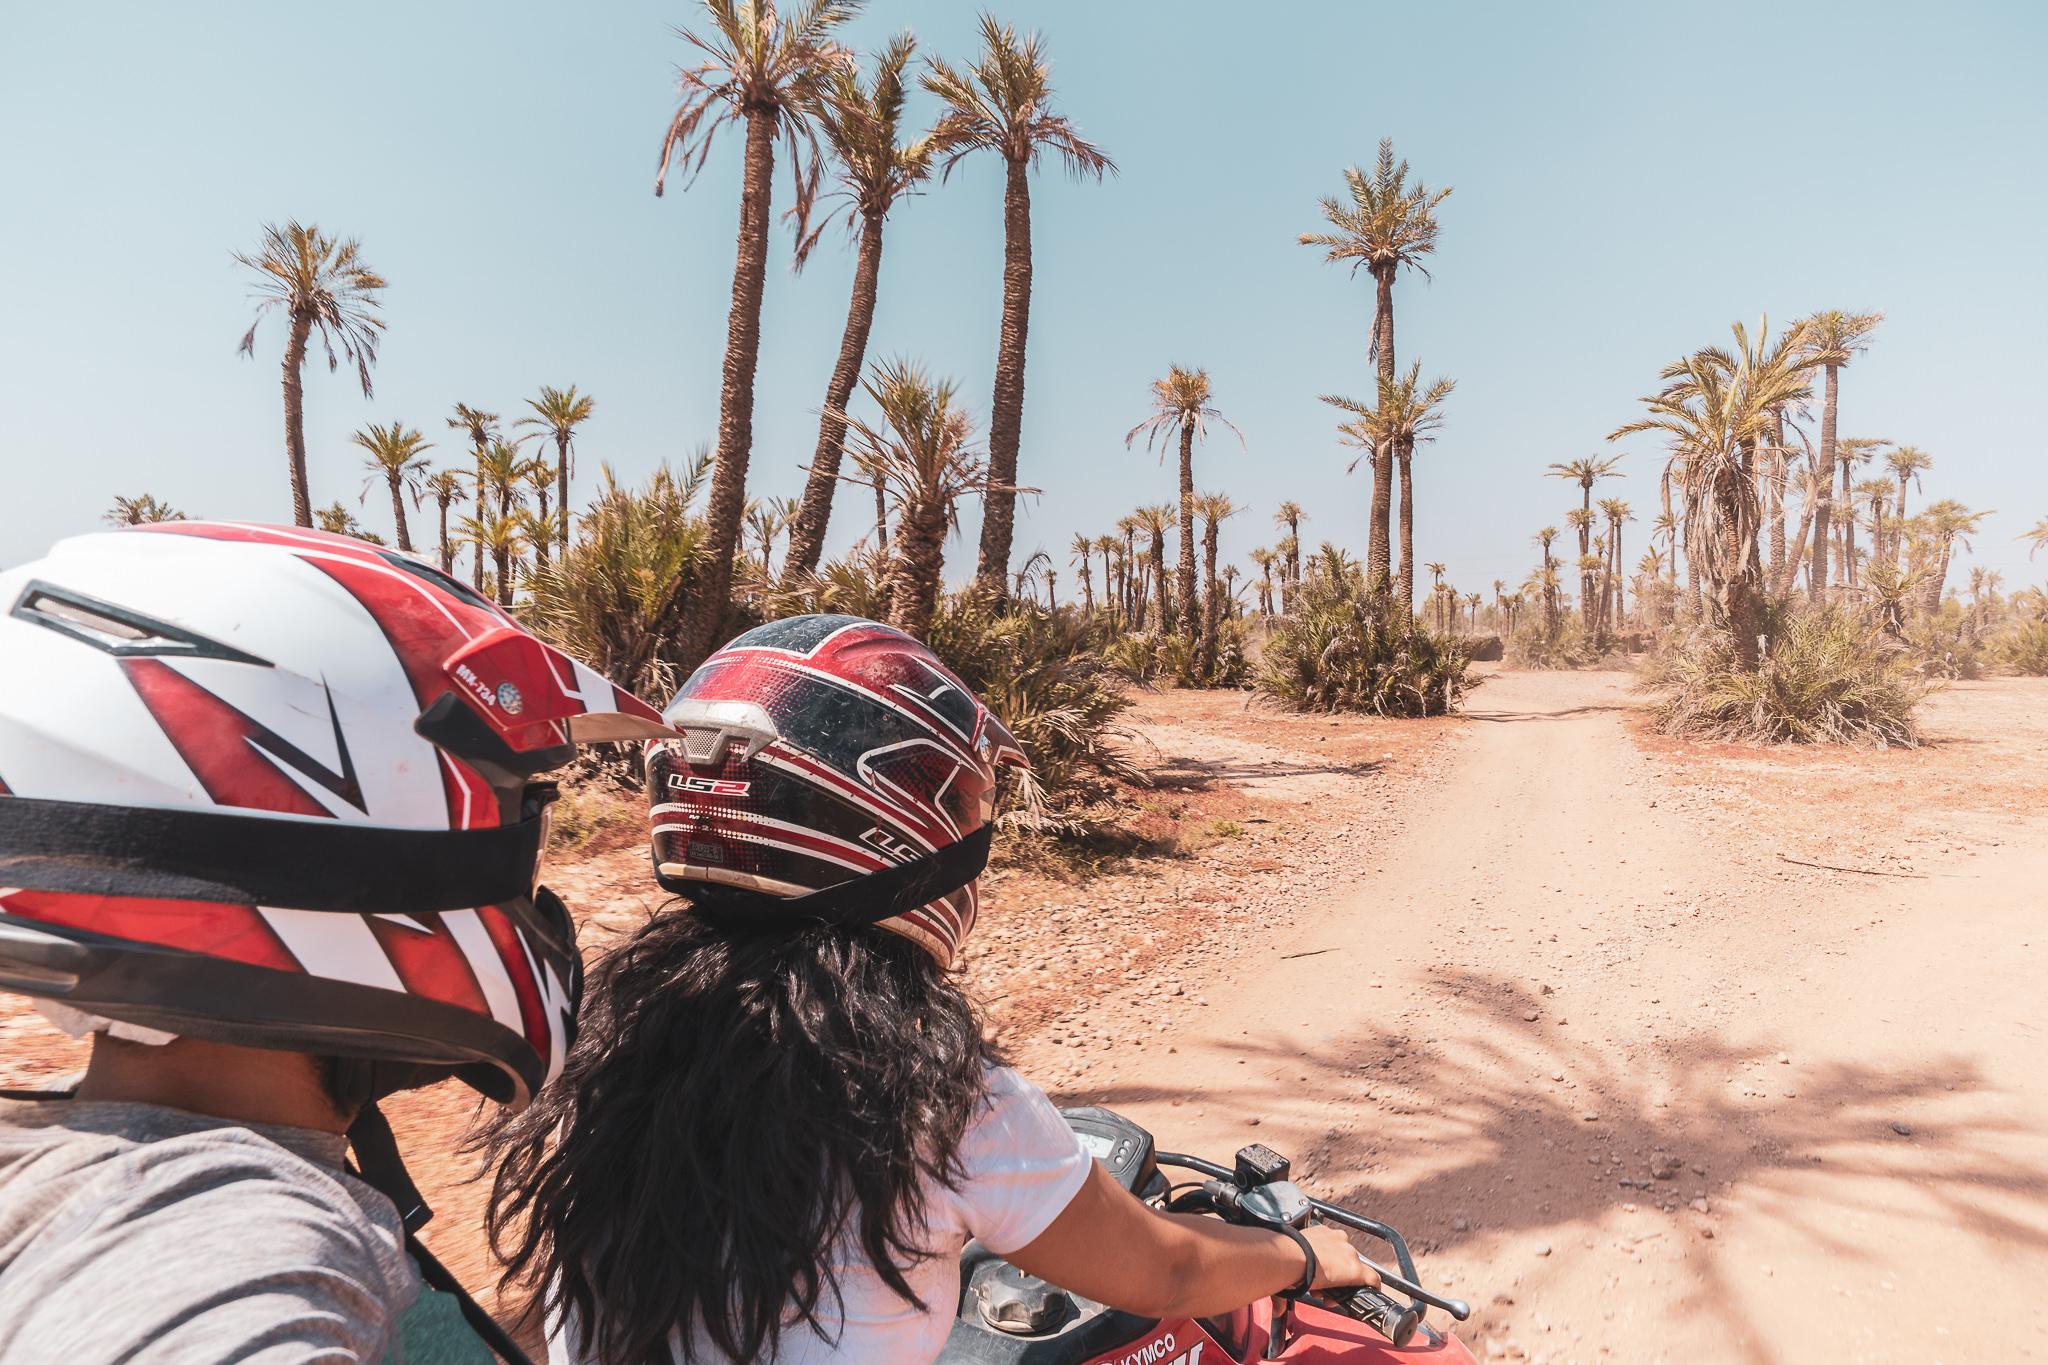 Maroc Quad Passion couple riding through Moroccan desert